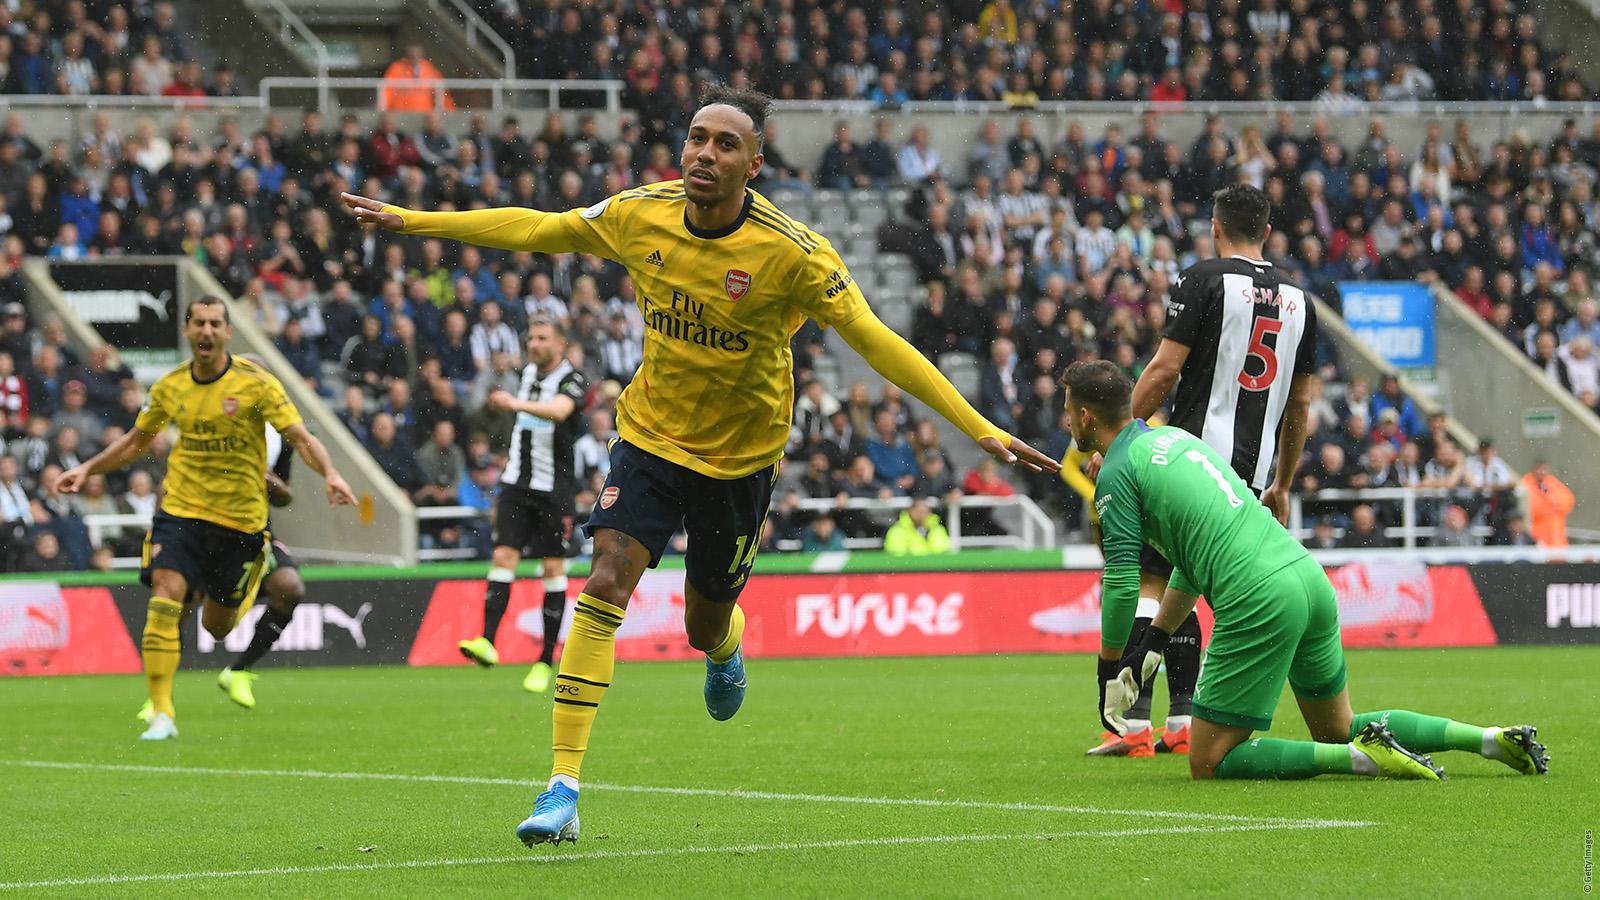 Soi kèo Arsenal vs Newcastle, Ngoại hạng Anh – 16/02/2020